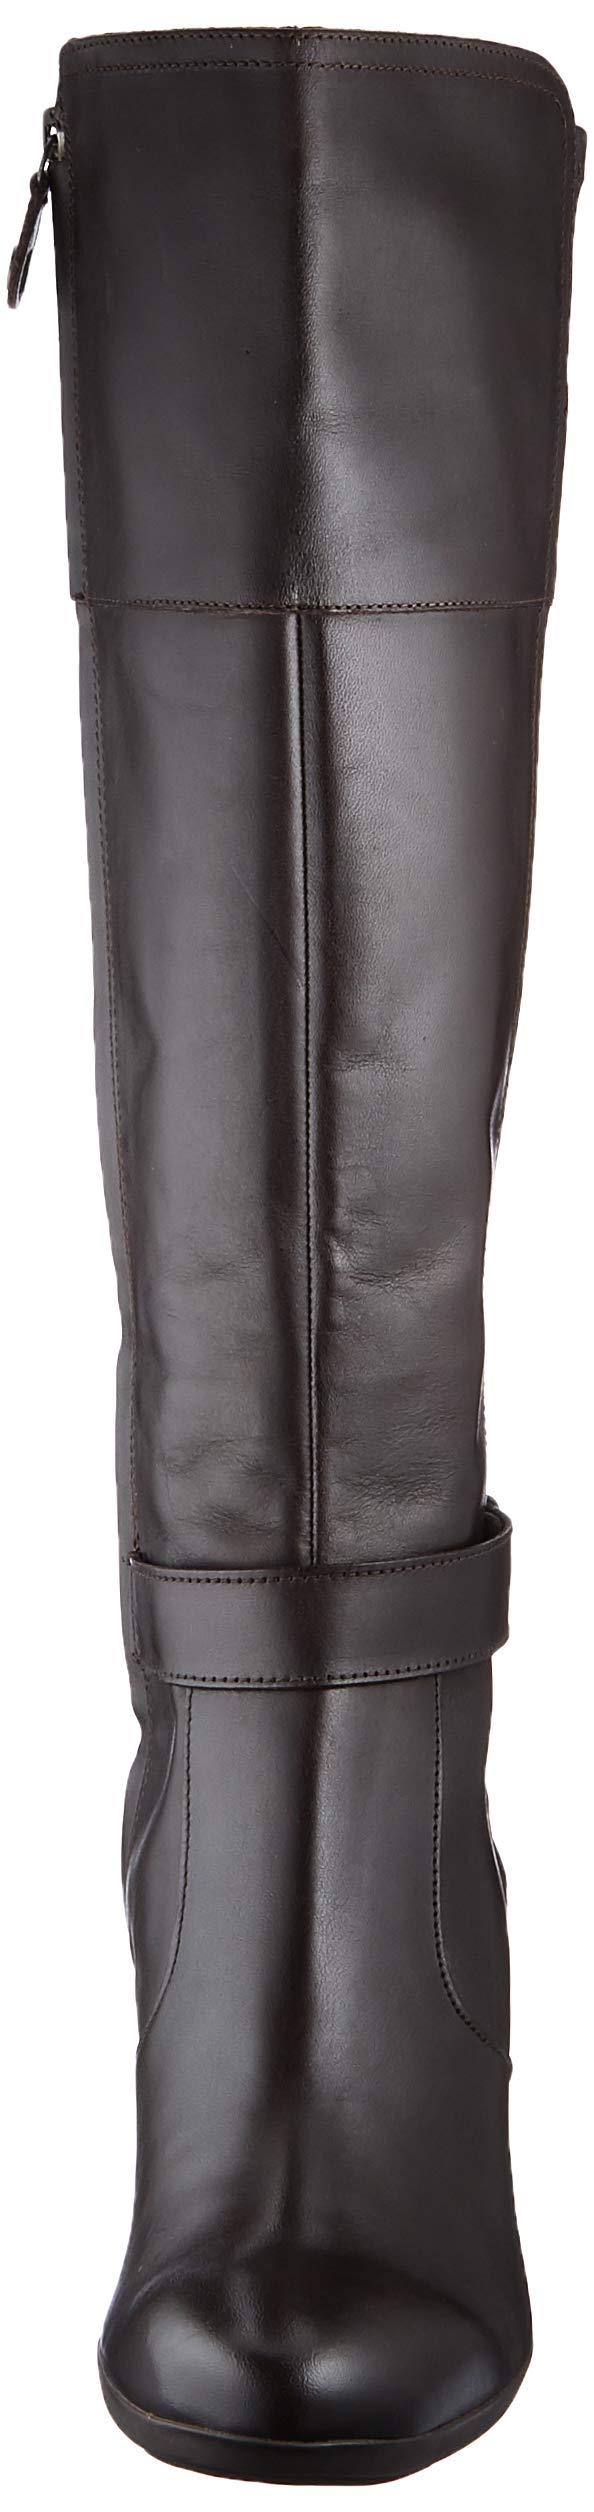 Geox Damen D Inspiration Wedge B Stiefel 4